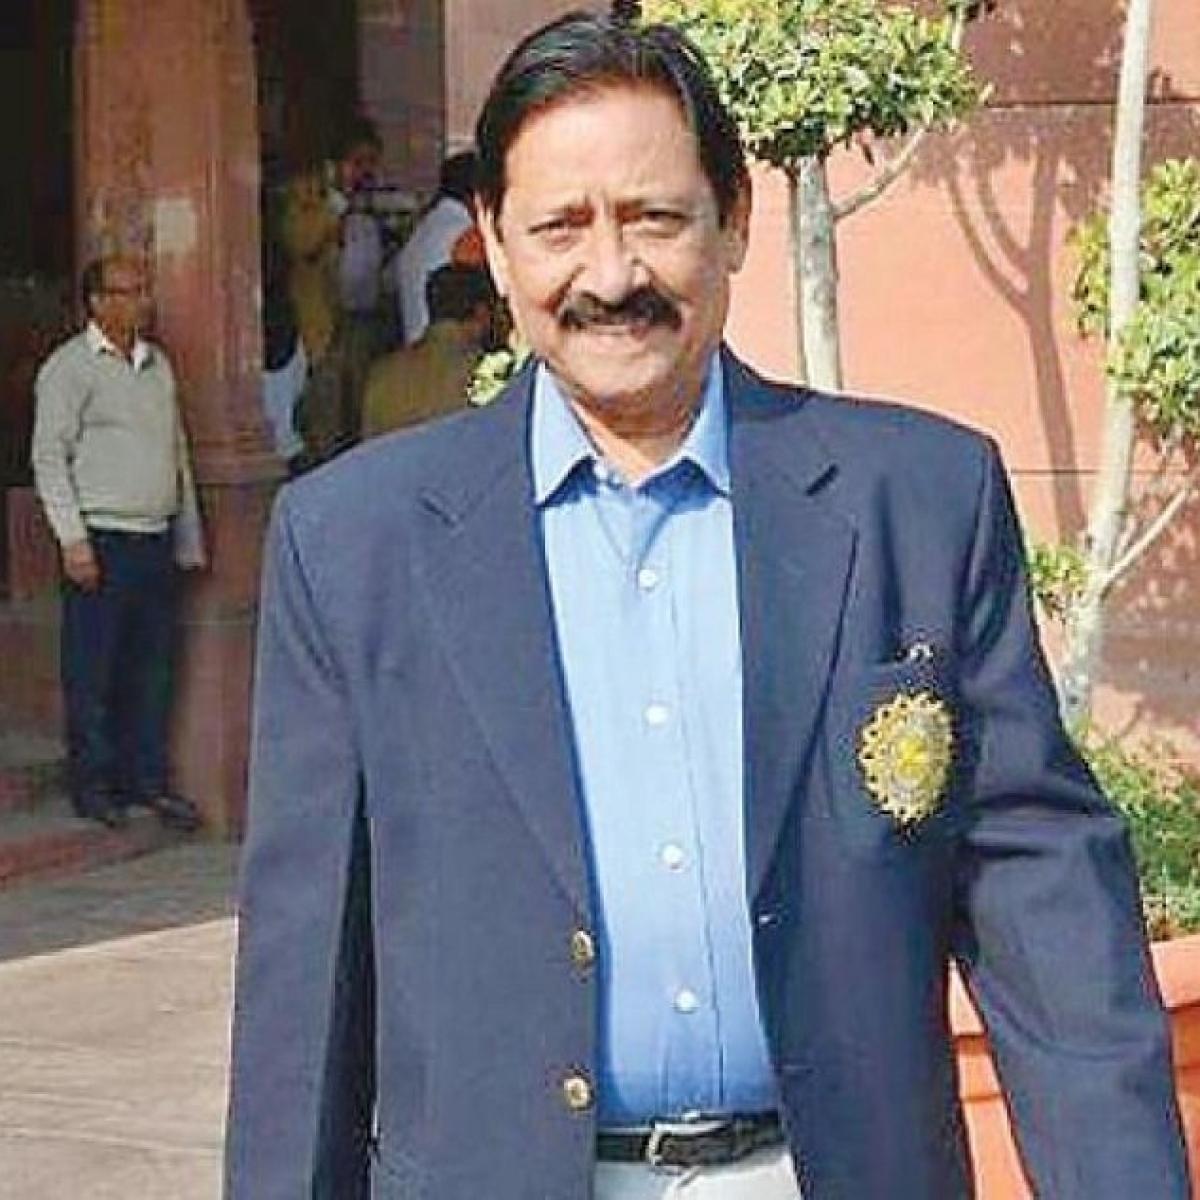 Cricketer turned BJP minister Chetan Chauhan passes away: Gautam Gambhir, Virender Sehwag condole his demise